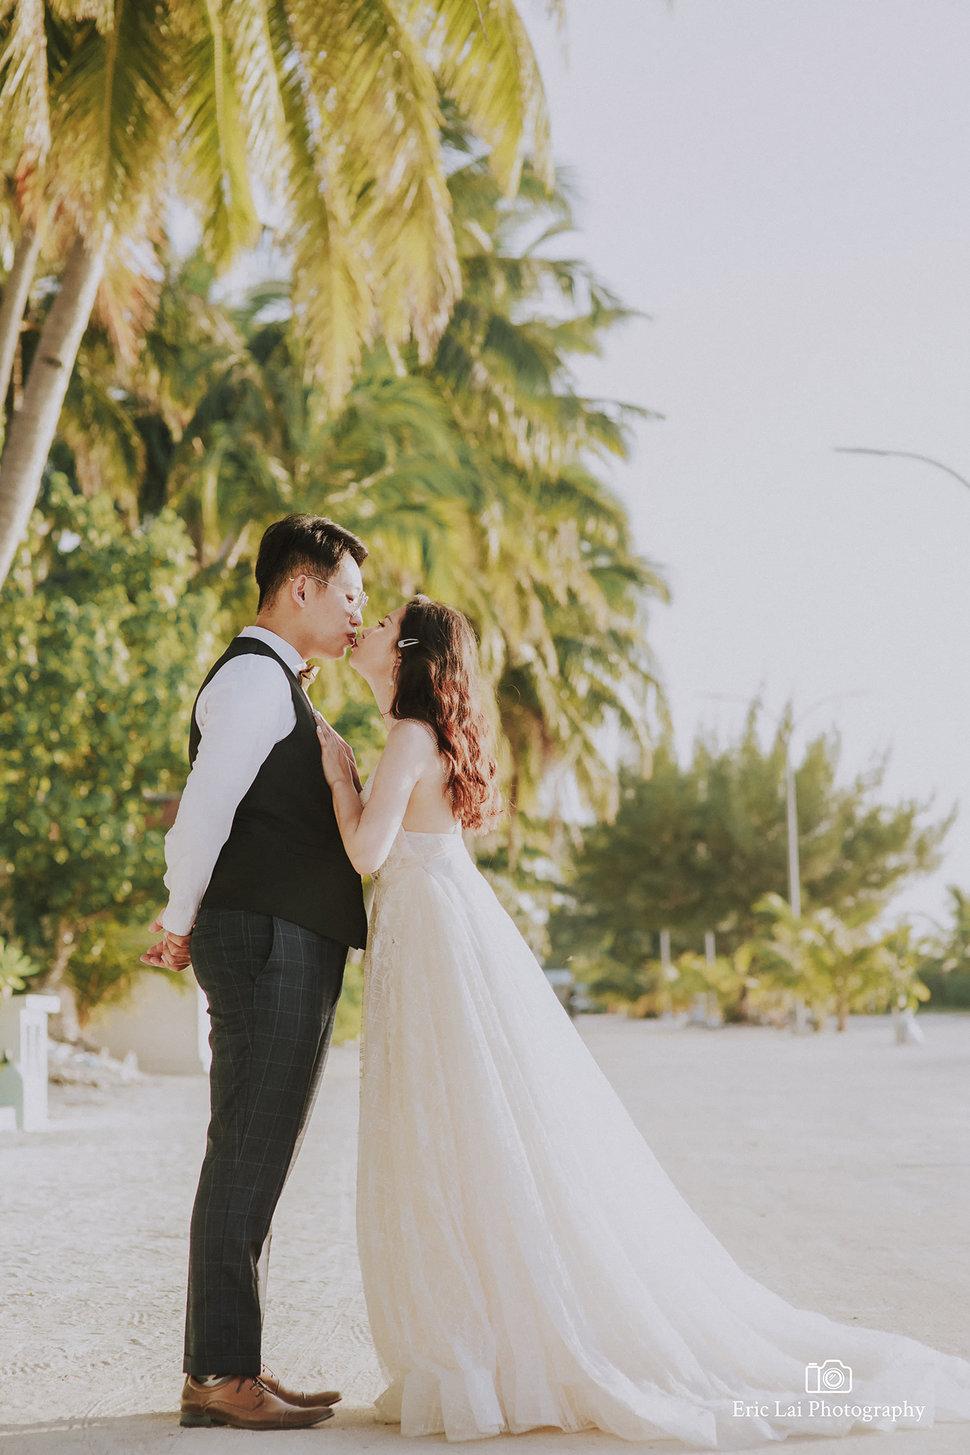 IMG_0719 - Eric Lai Studio婚禮婚紗攝影團隊《結婚吧》